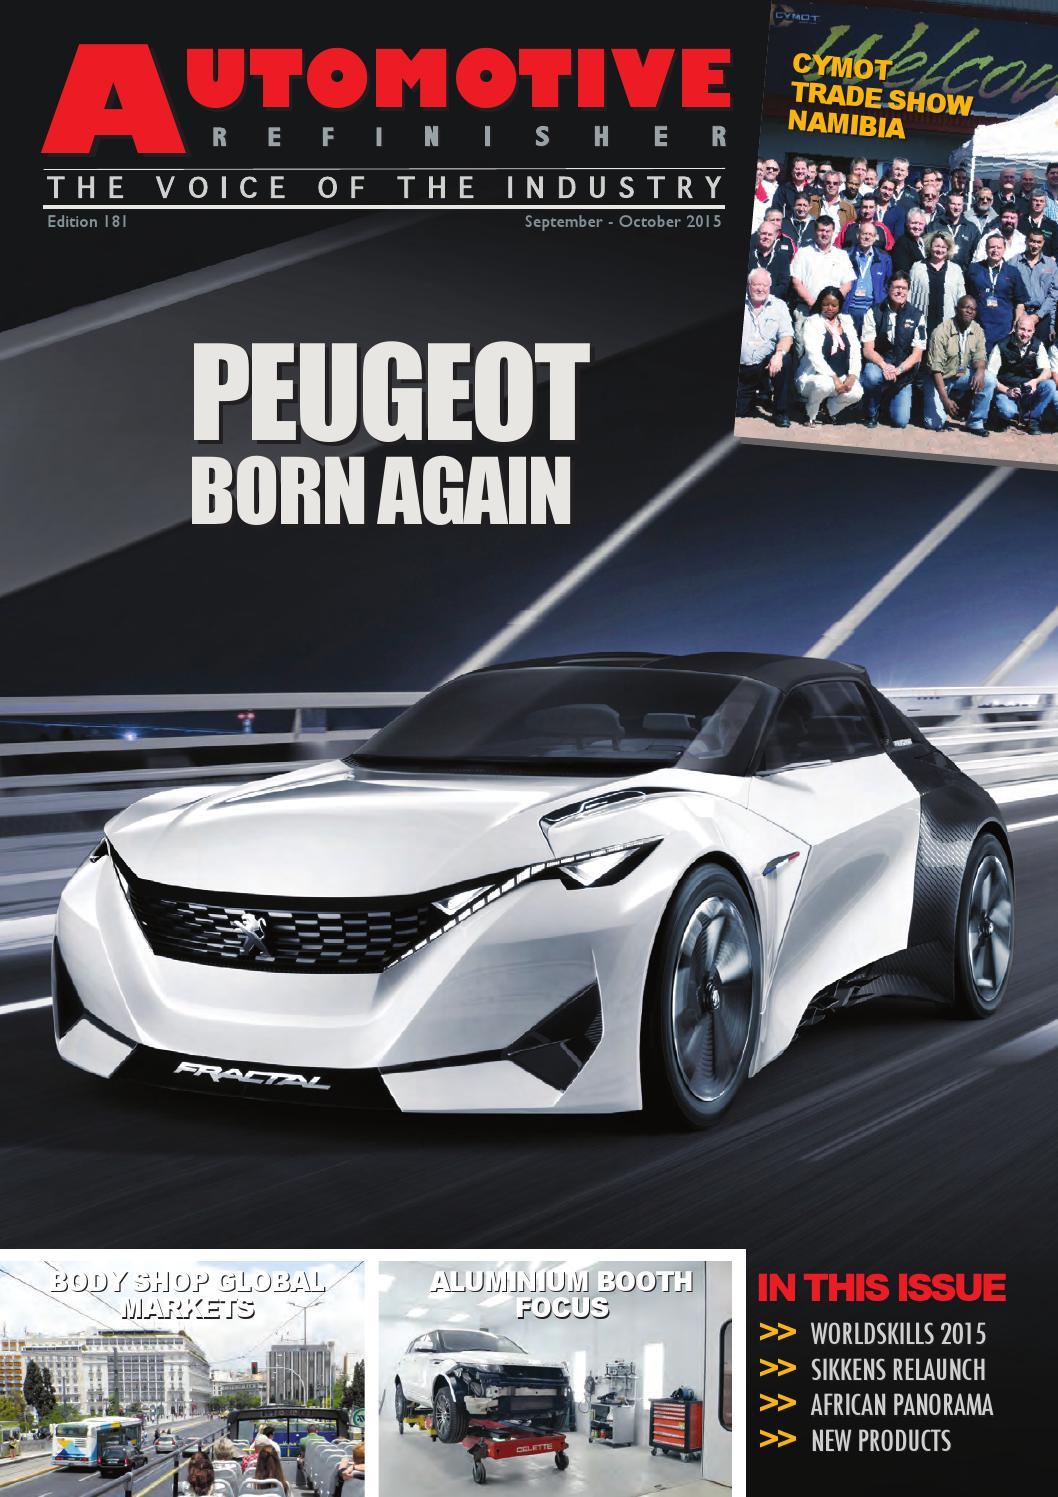 New Drive Shaft Front RH Citroen C-Crosser Peugeot 4007 07-12 ABS